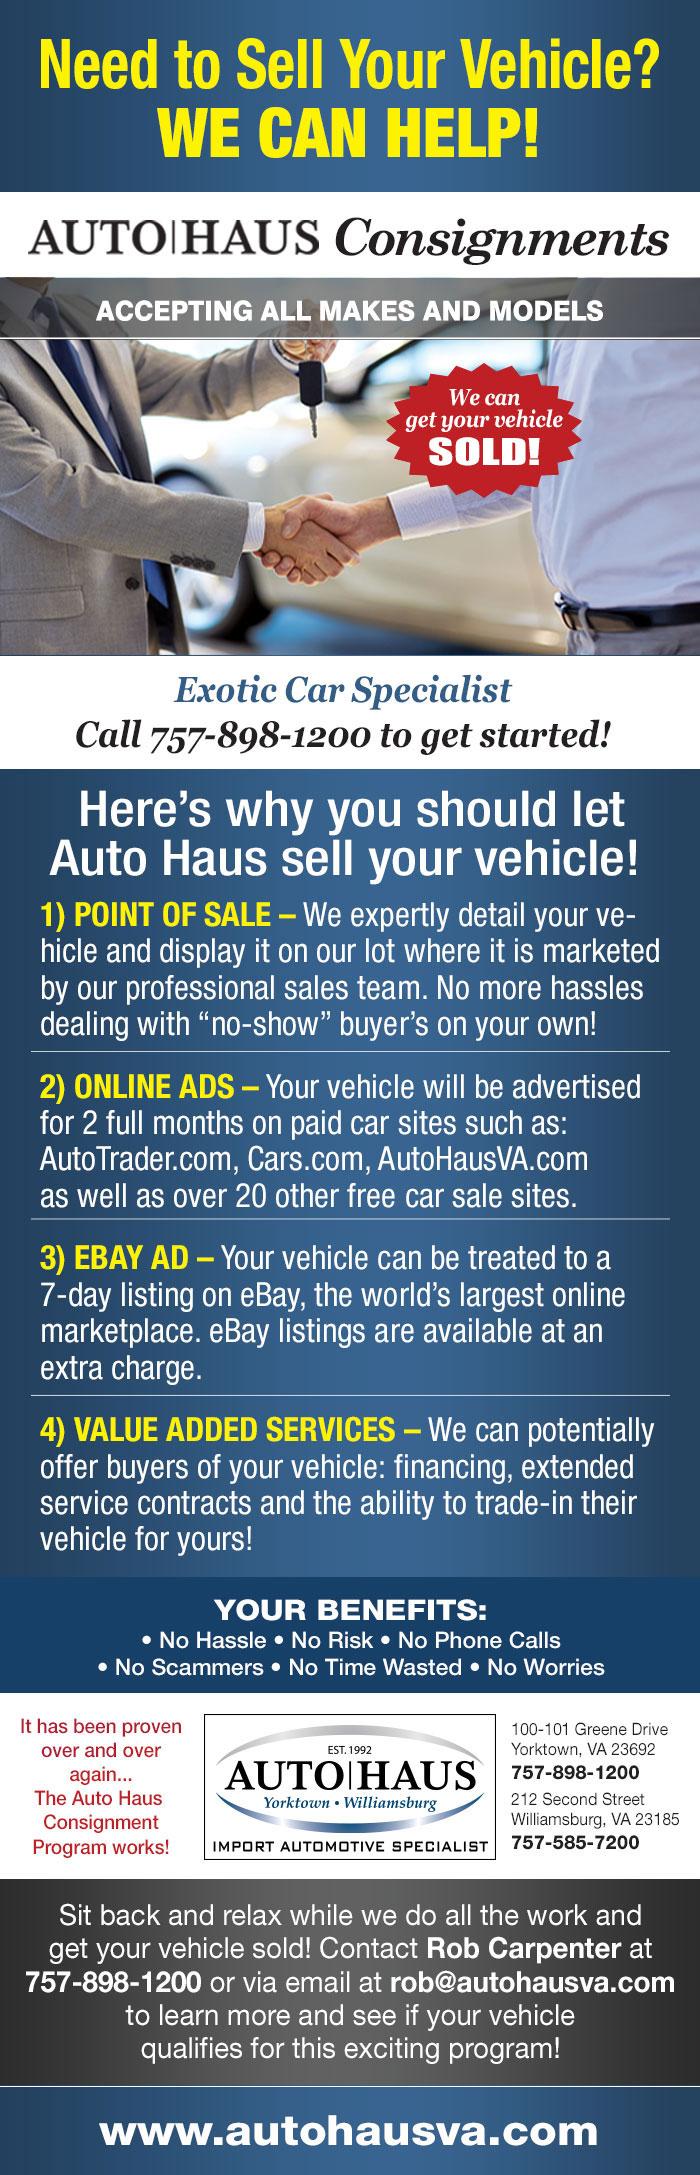 Auto Haus | New dealership in Yorktown, VA 23692